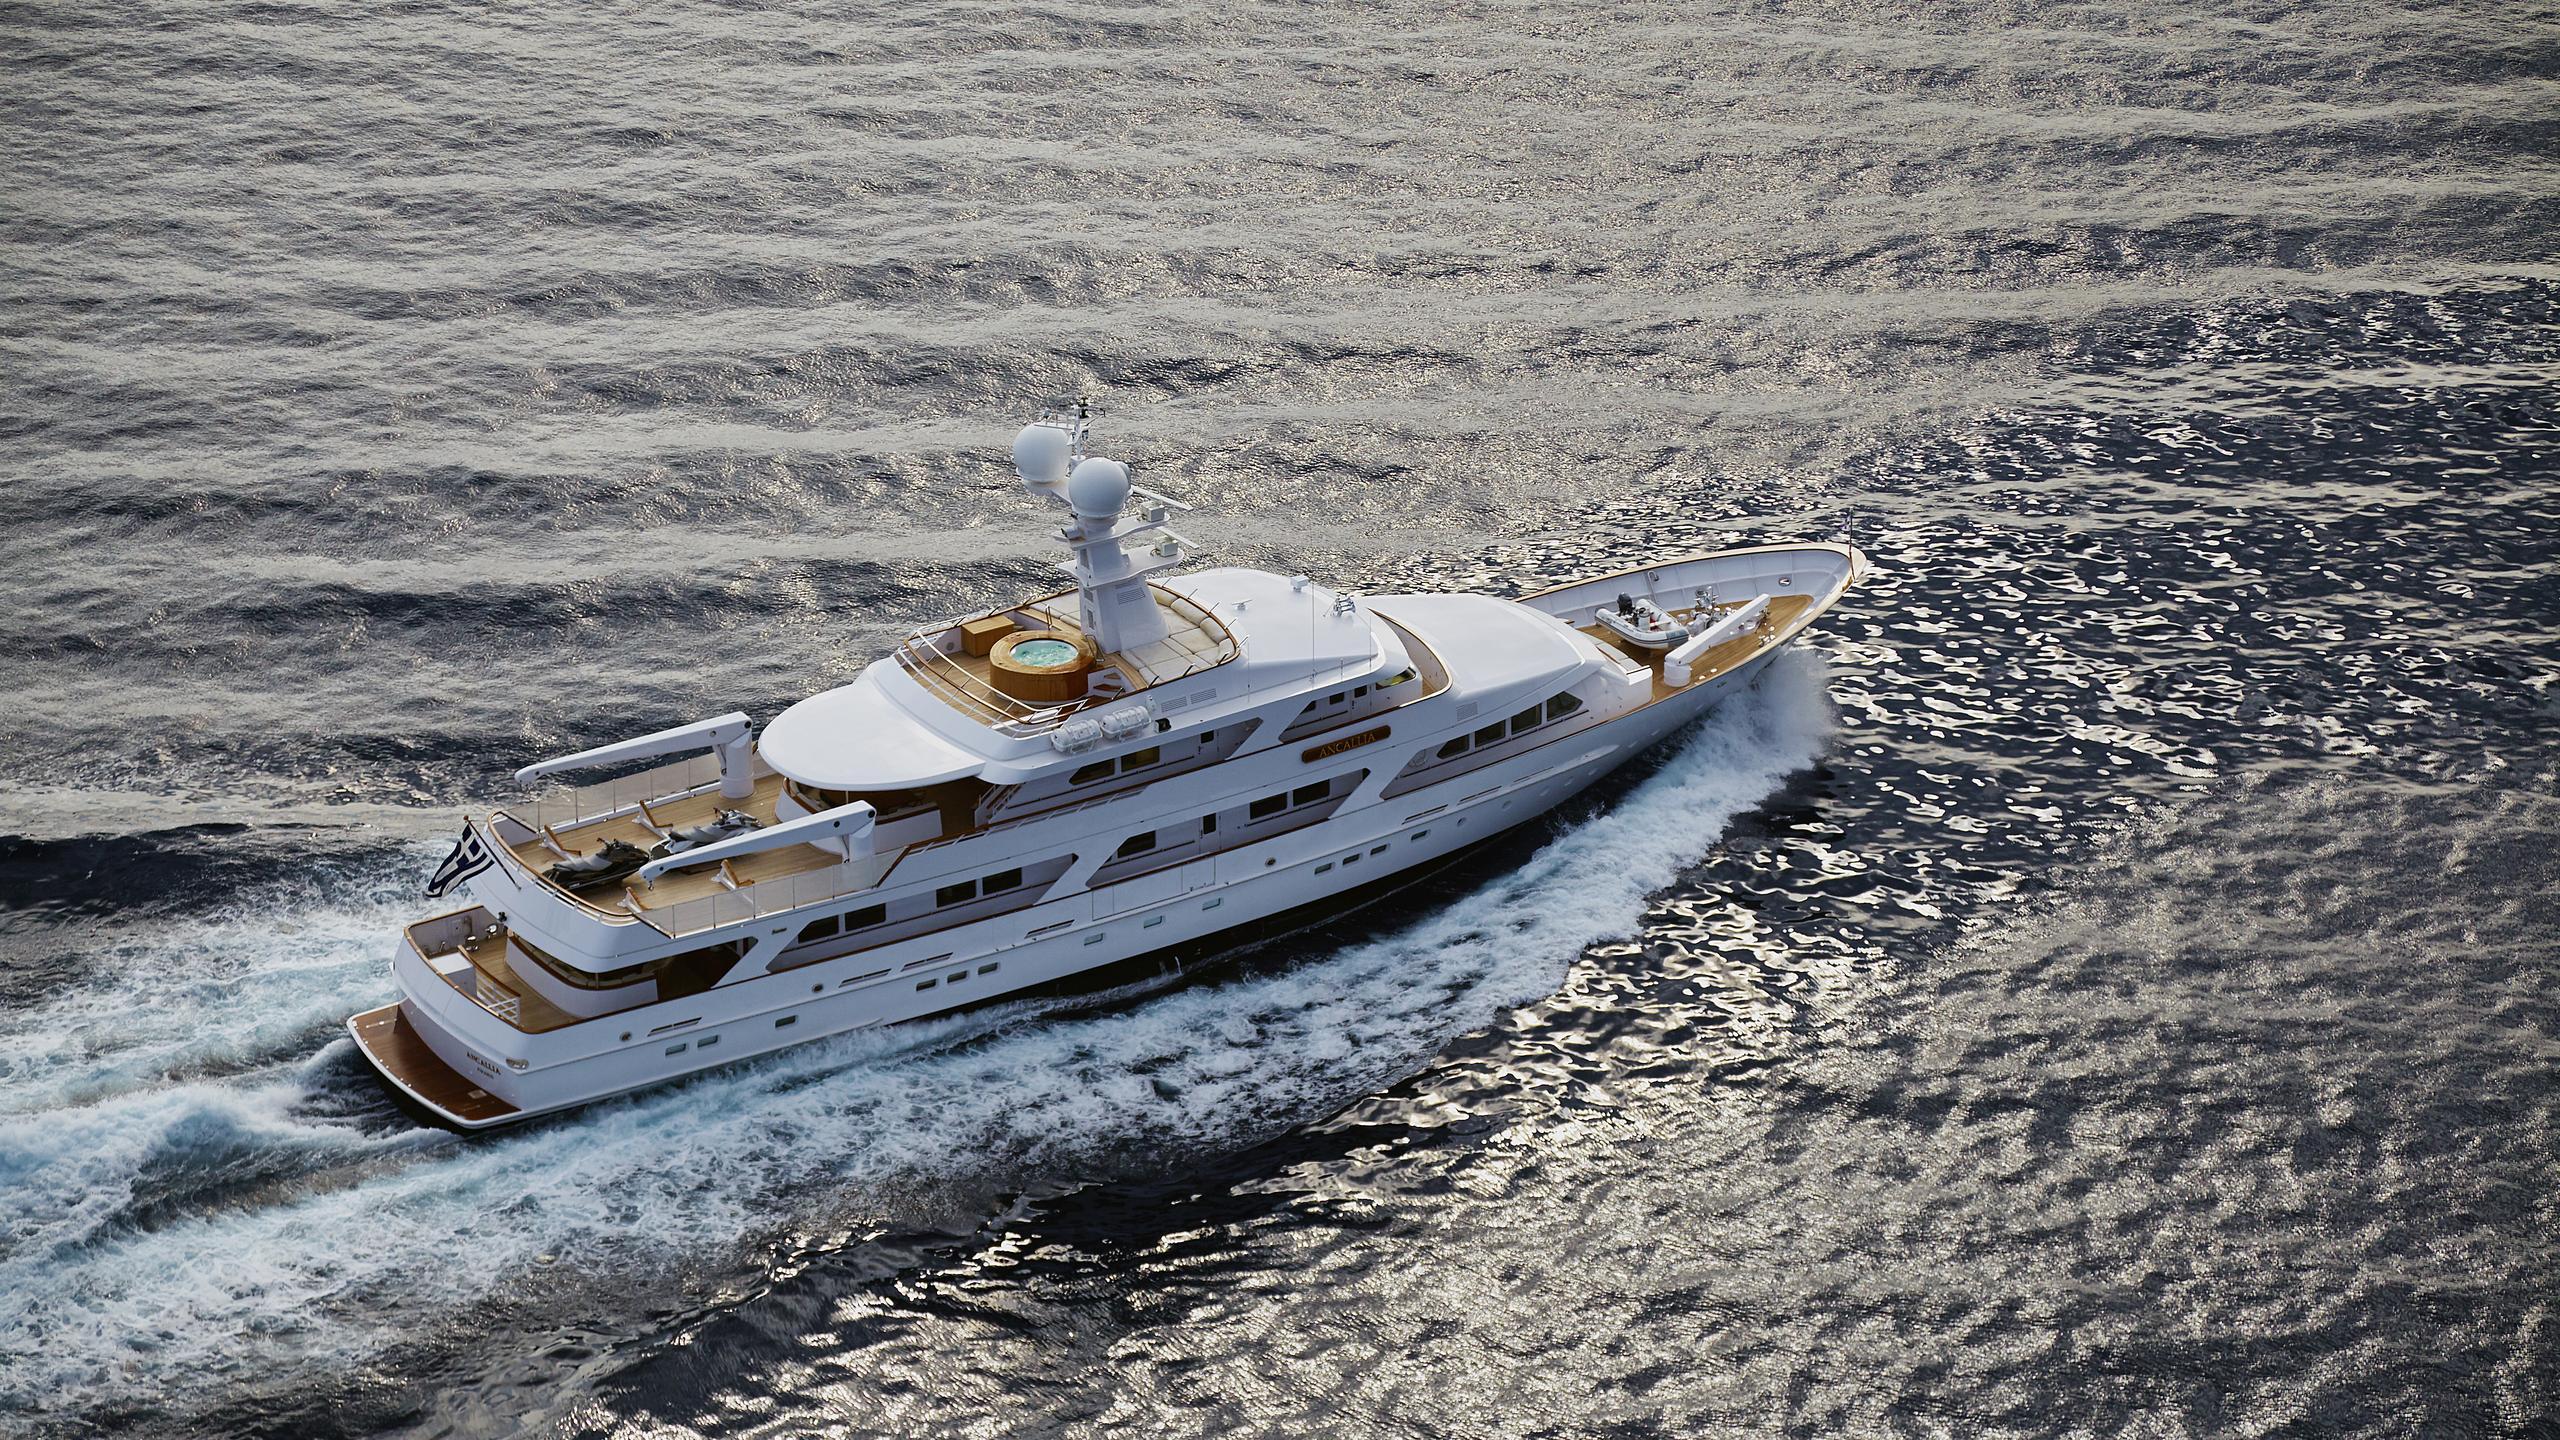 ancallia-yacht-at-sea